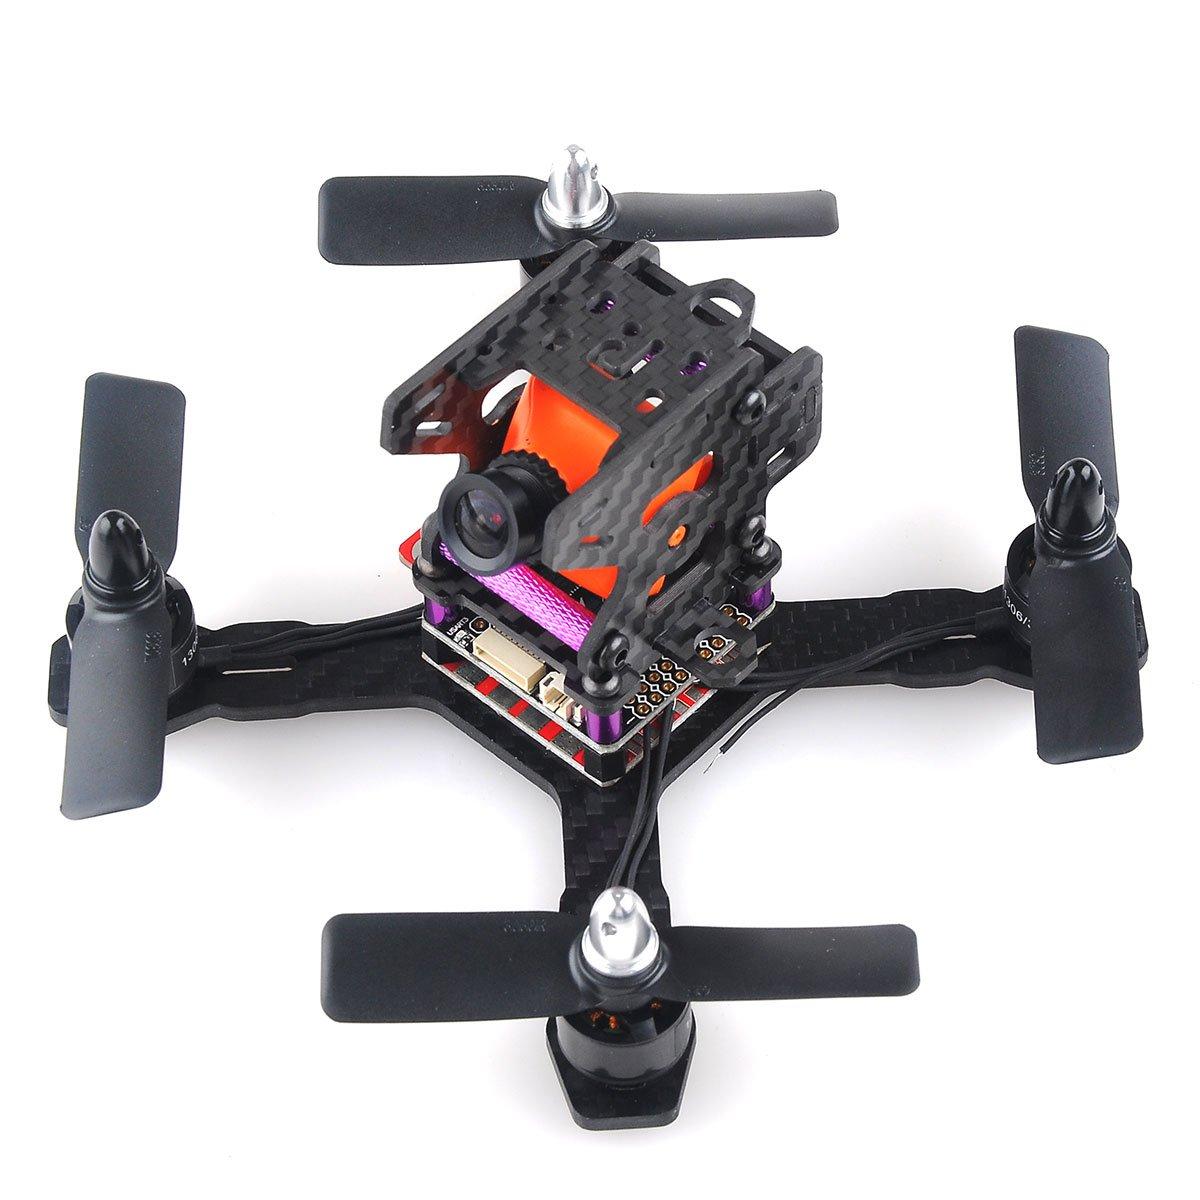 Amazon.com: Crazepony X150 FPV Racing Drone Mini Quadcopter Carbon ...